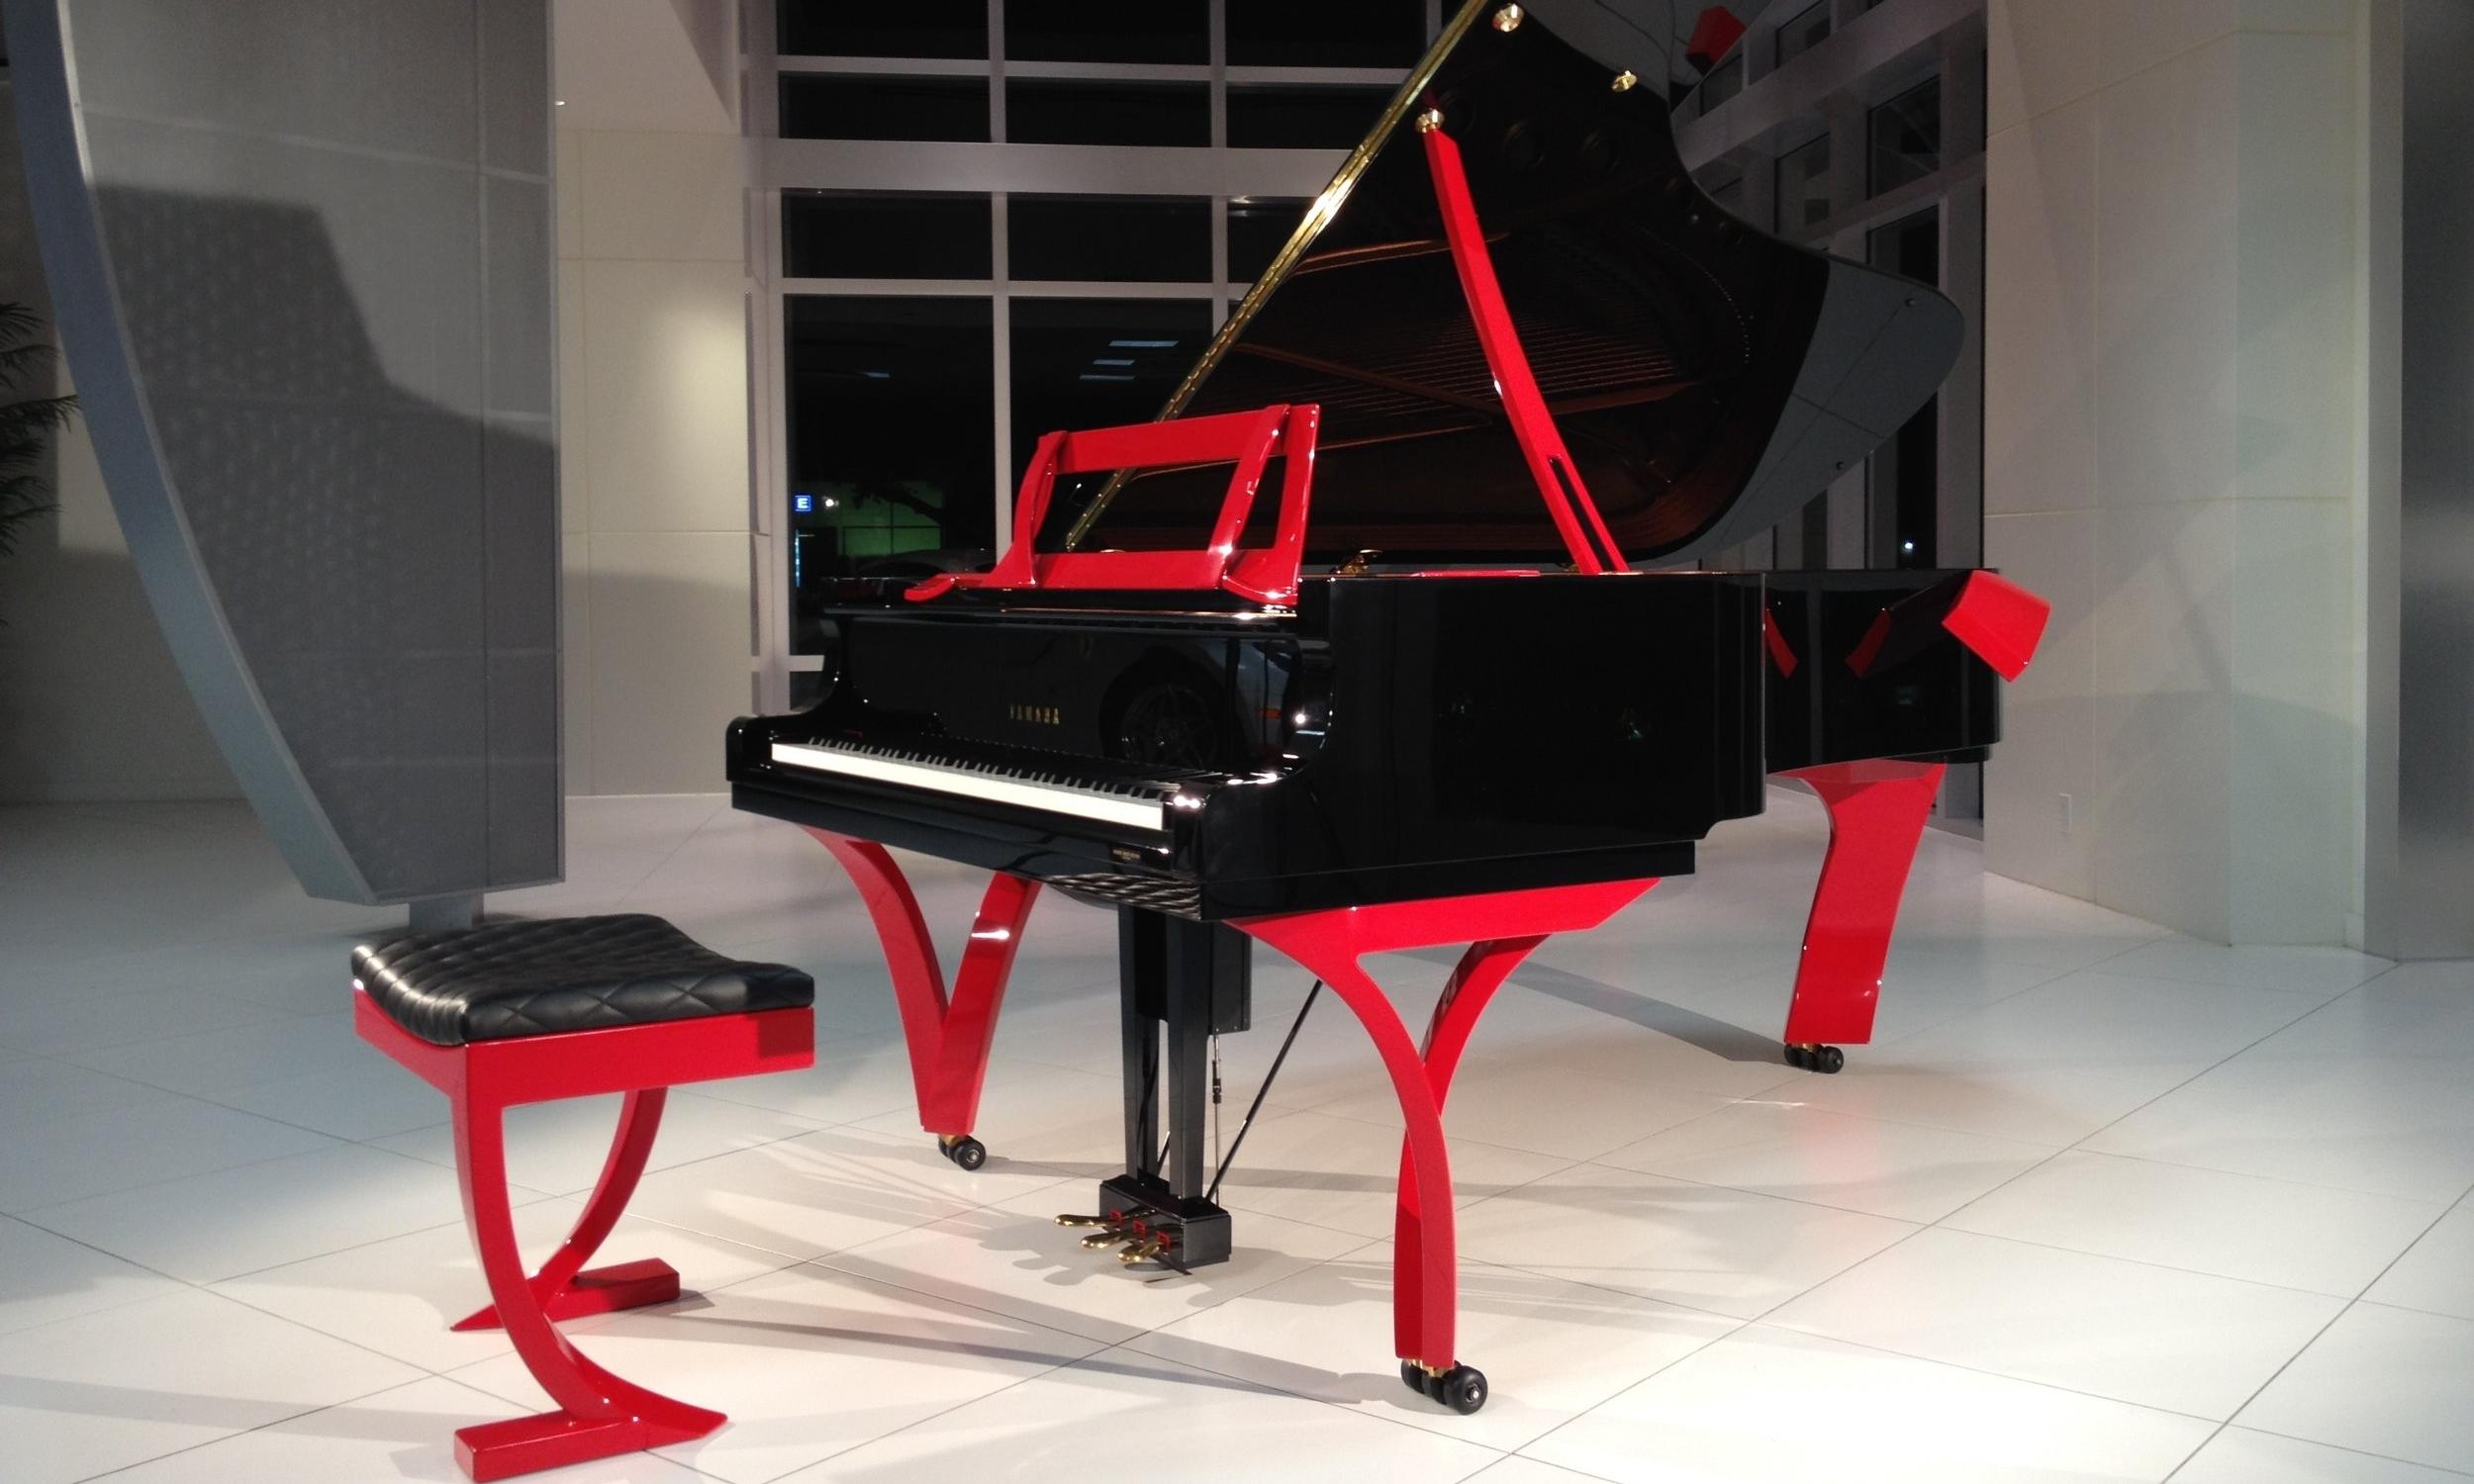 Custom Ferrari Red Piano by J Elliott & Co